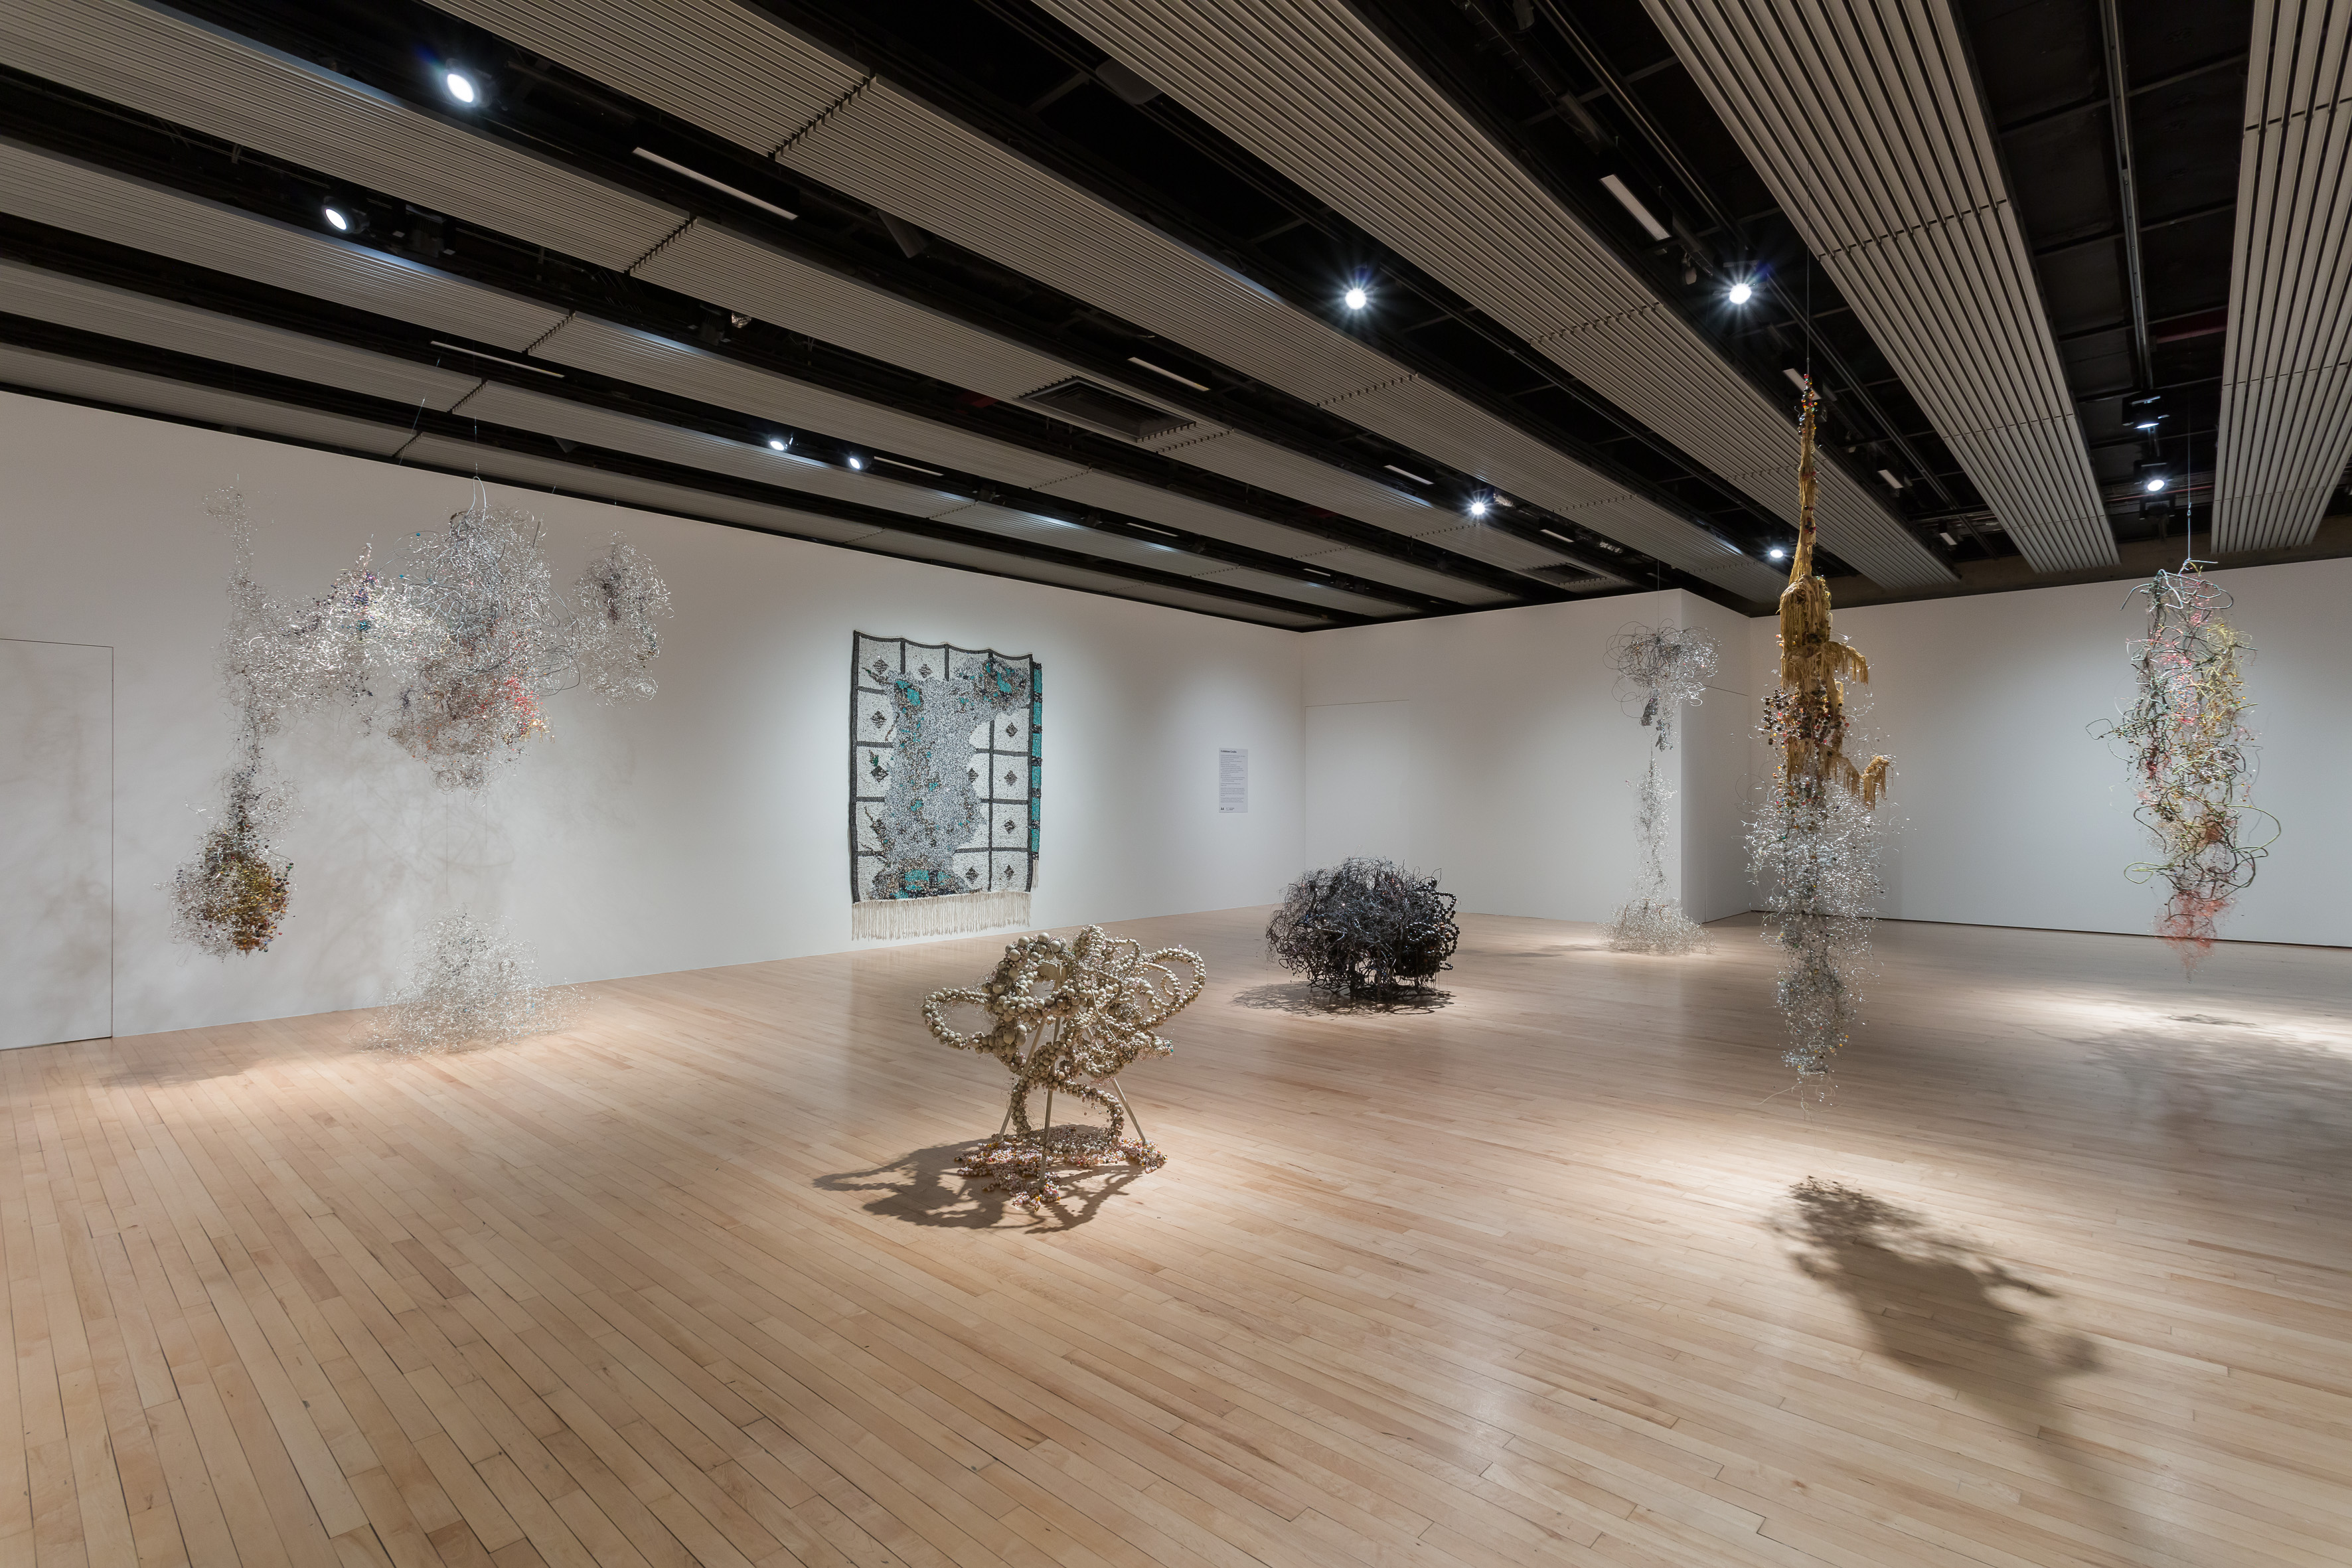 Installation View: Igshaan Adams: Kicking Dust, Hayward Gallery, London, 19 May – 25 July 2021. Photo: Mark Blower